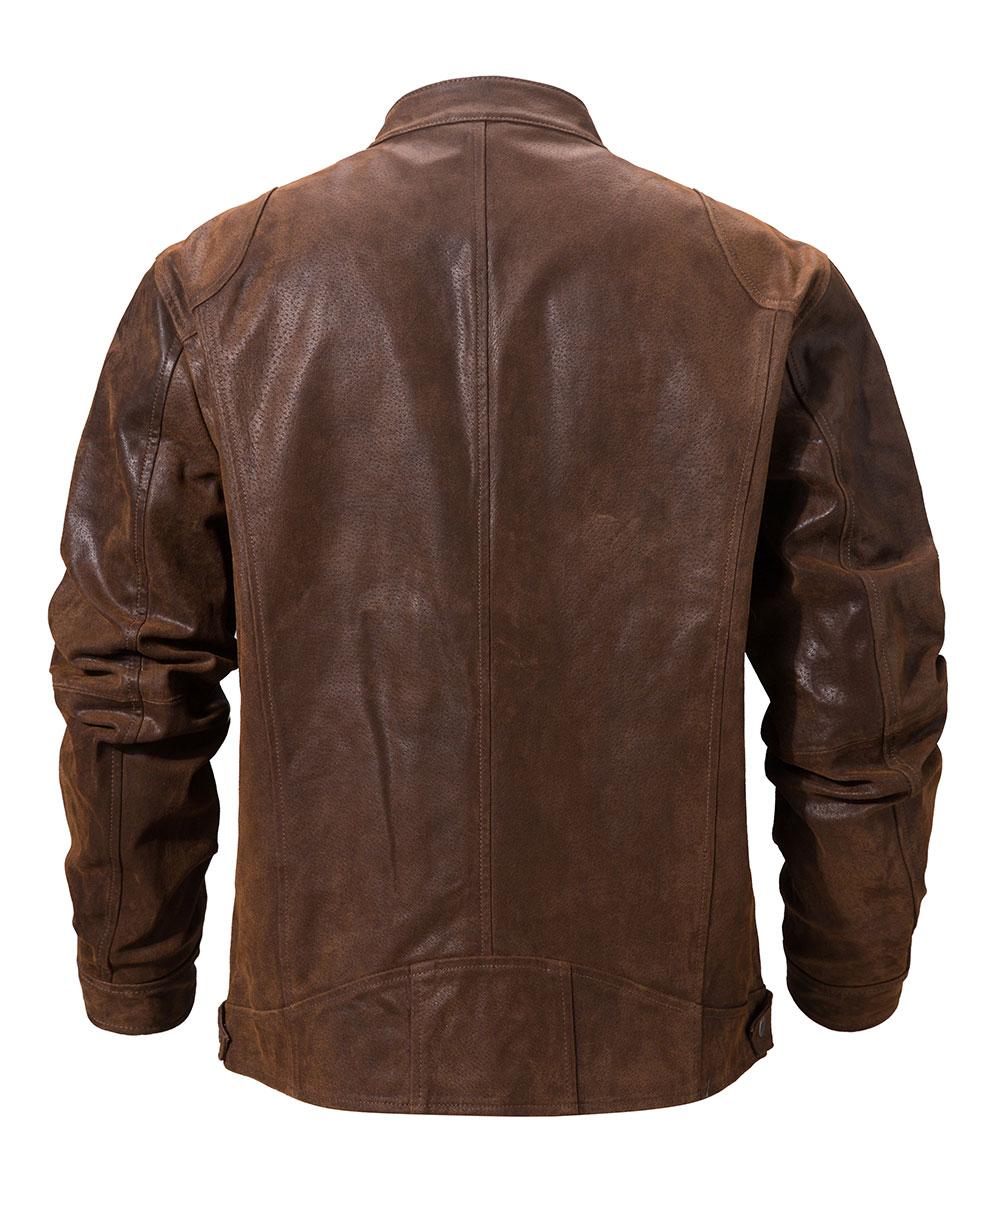 H266c708496784c7e85924f27c7030fcbw Men's Pigskin Real Leather Jacket Motorcycle Jacket Coat Men